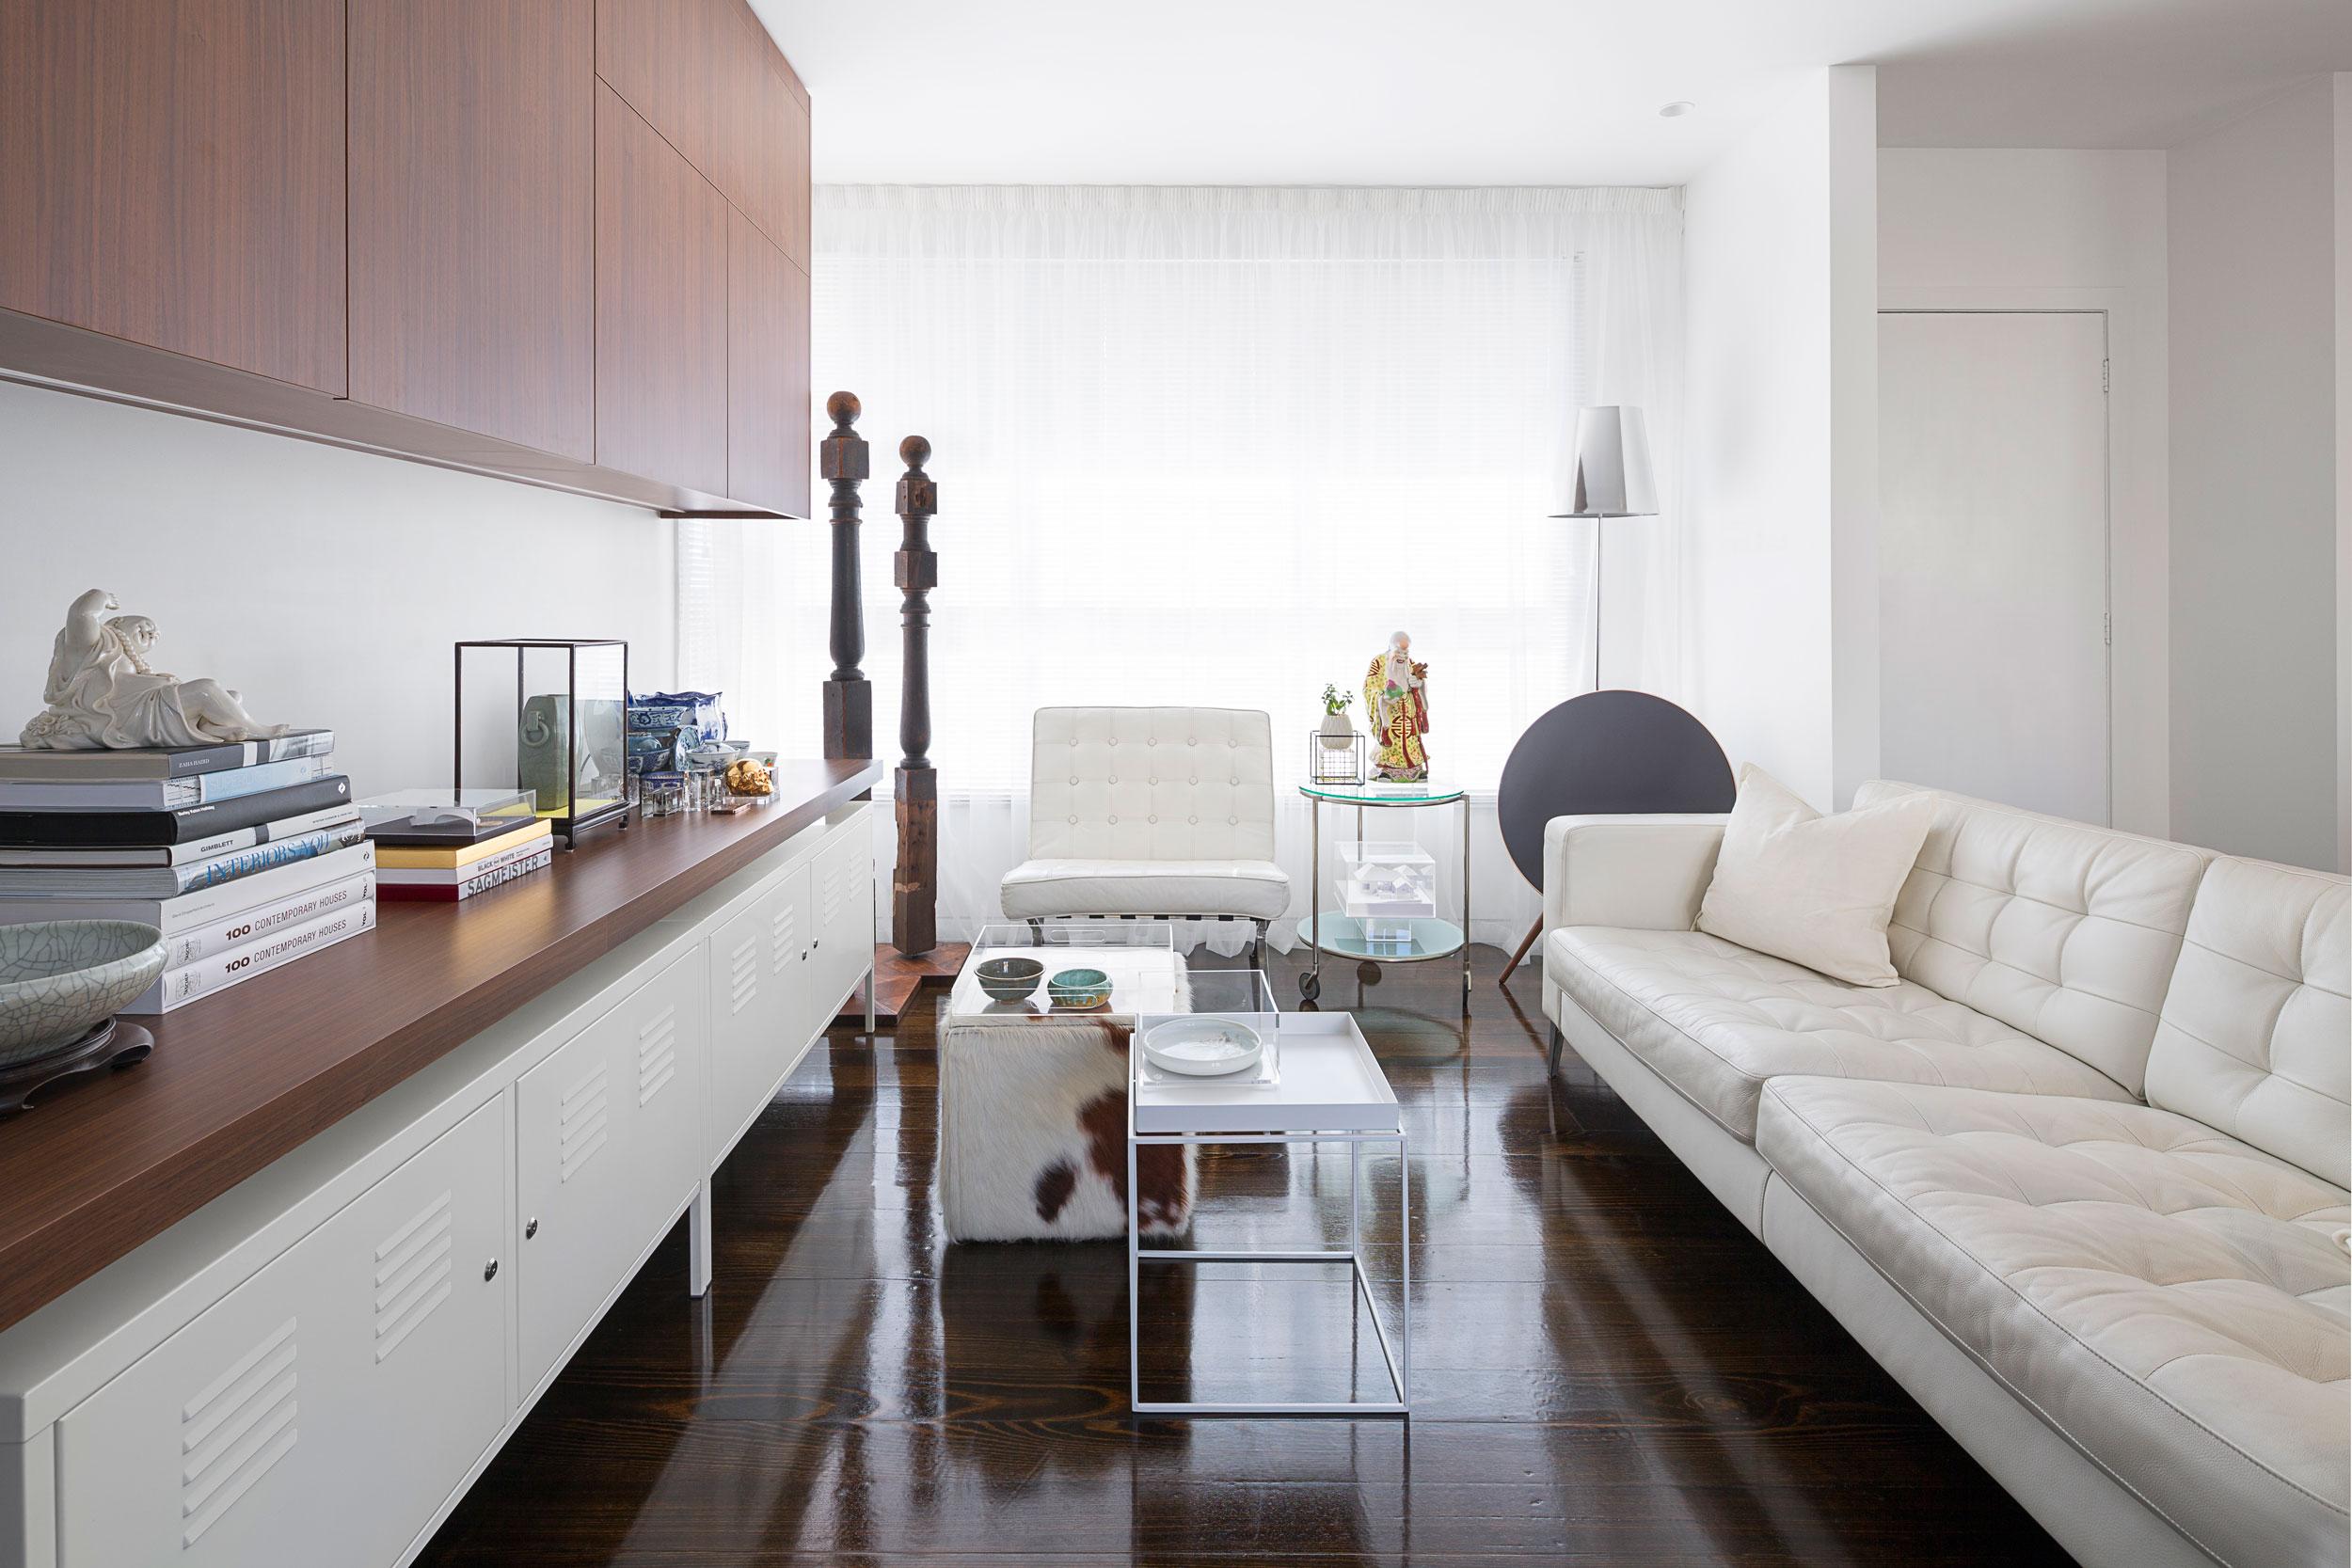 Sarah_Anderson_Photography_SWG_Studio_interior_loungeroom